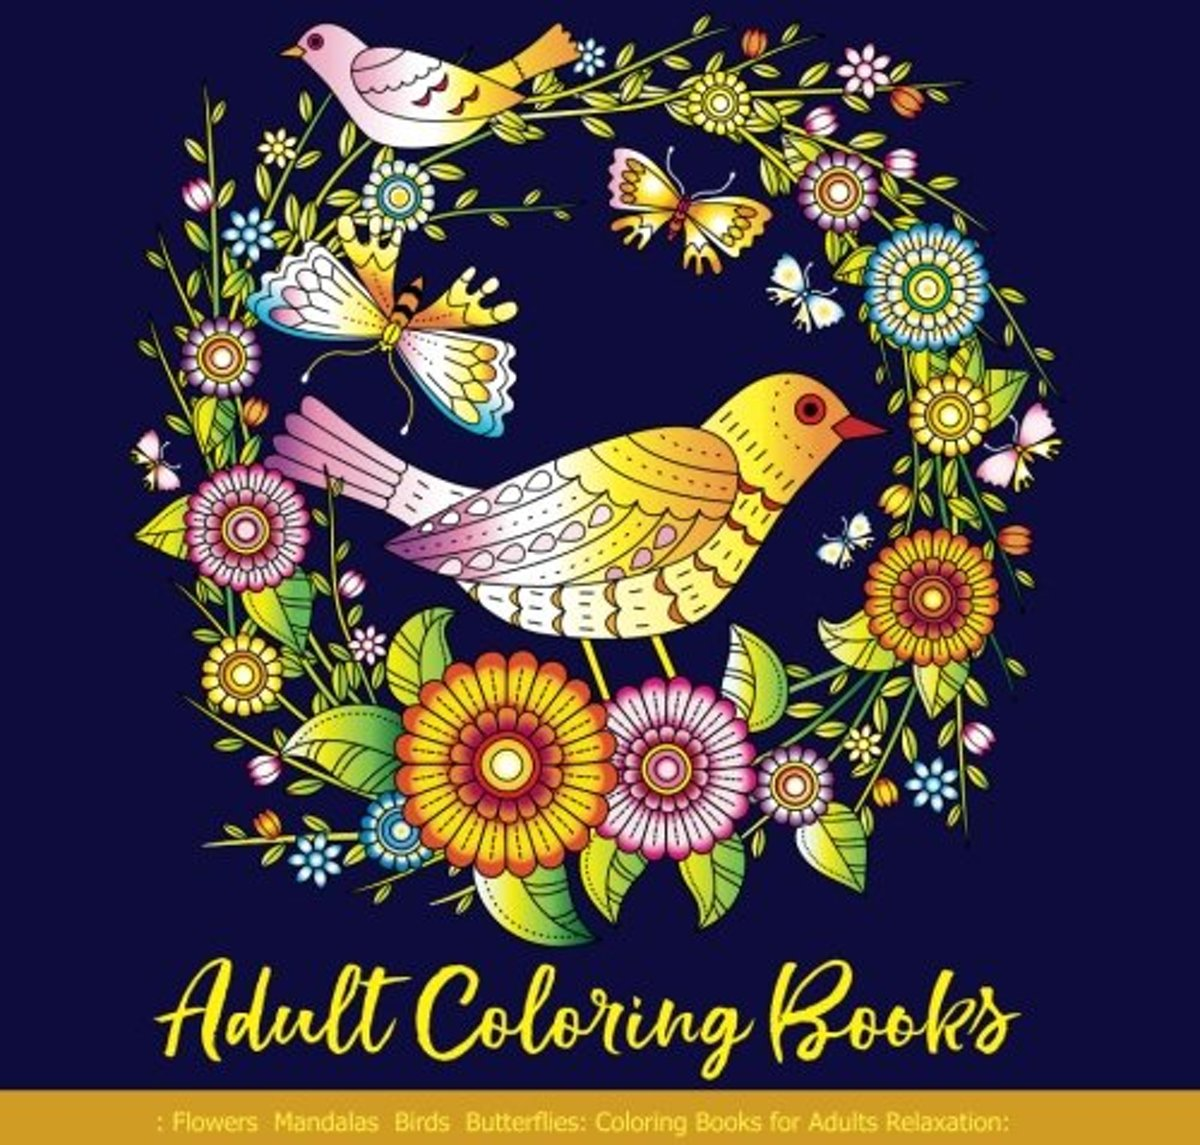 Adult Coloring Books: Flowers Mandalas Birds Butterflies kopen